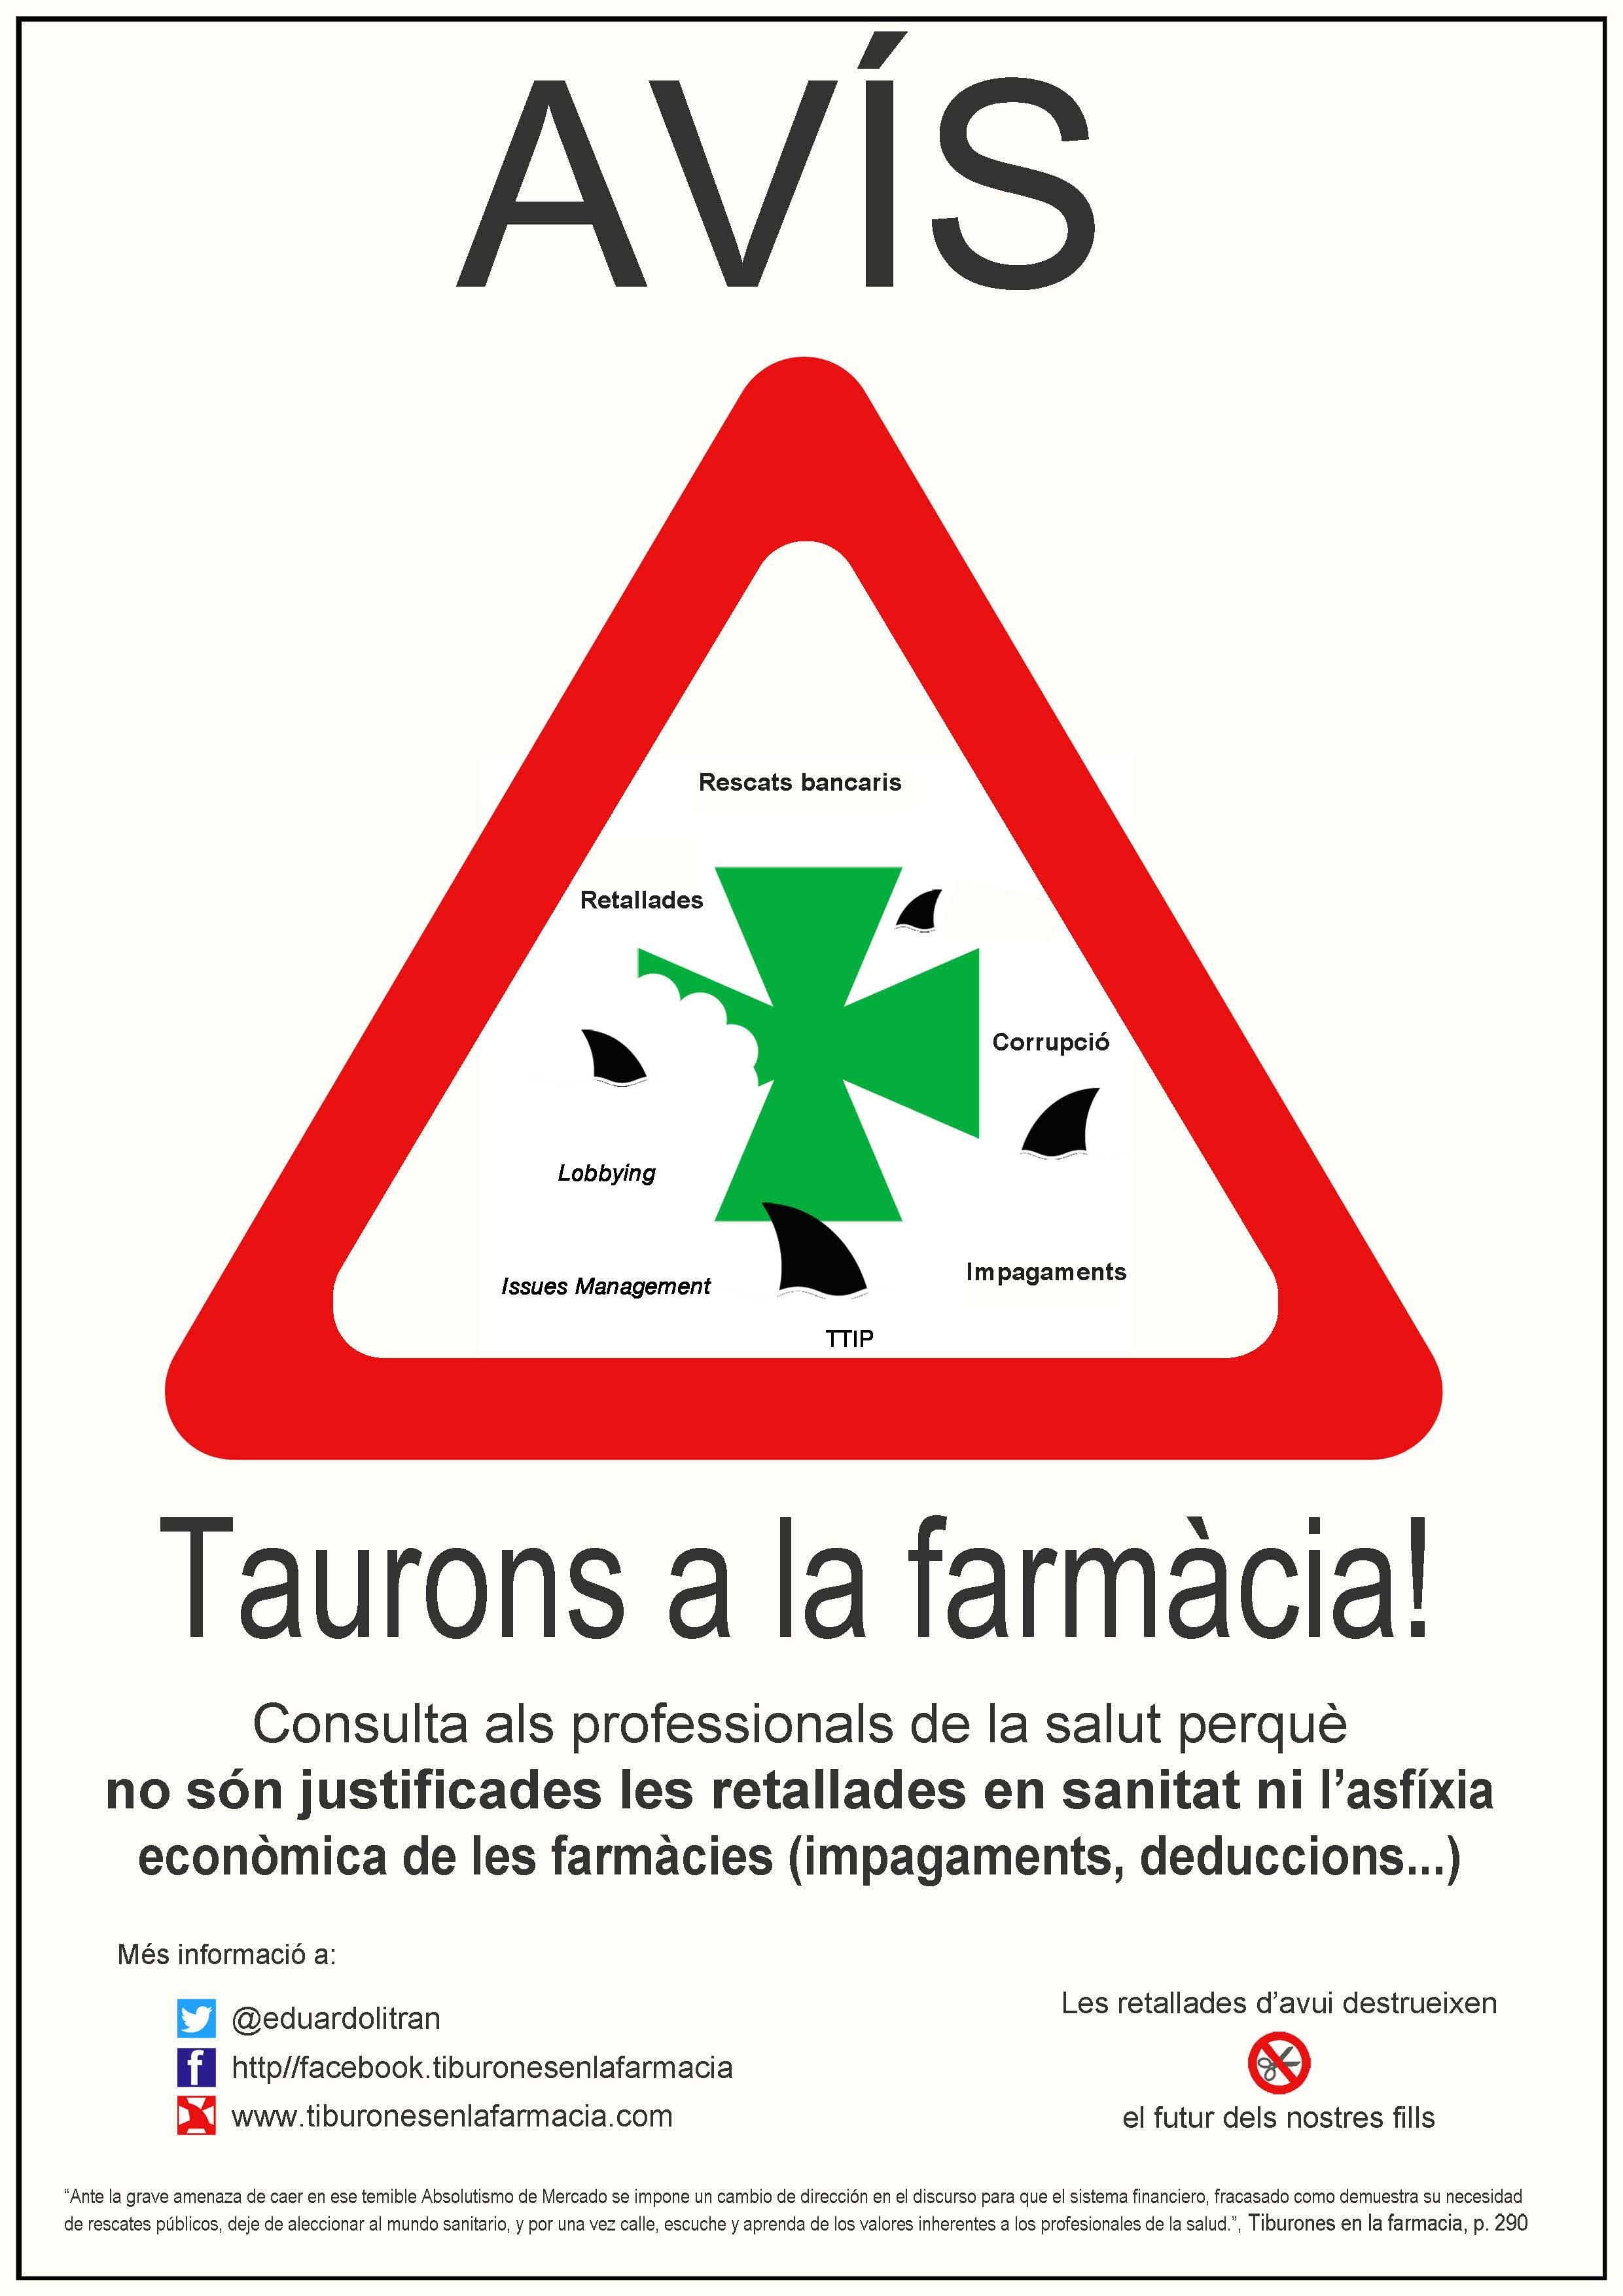 Avís-Taurons-a-la-farmàcia